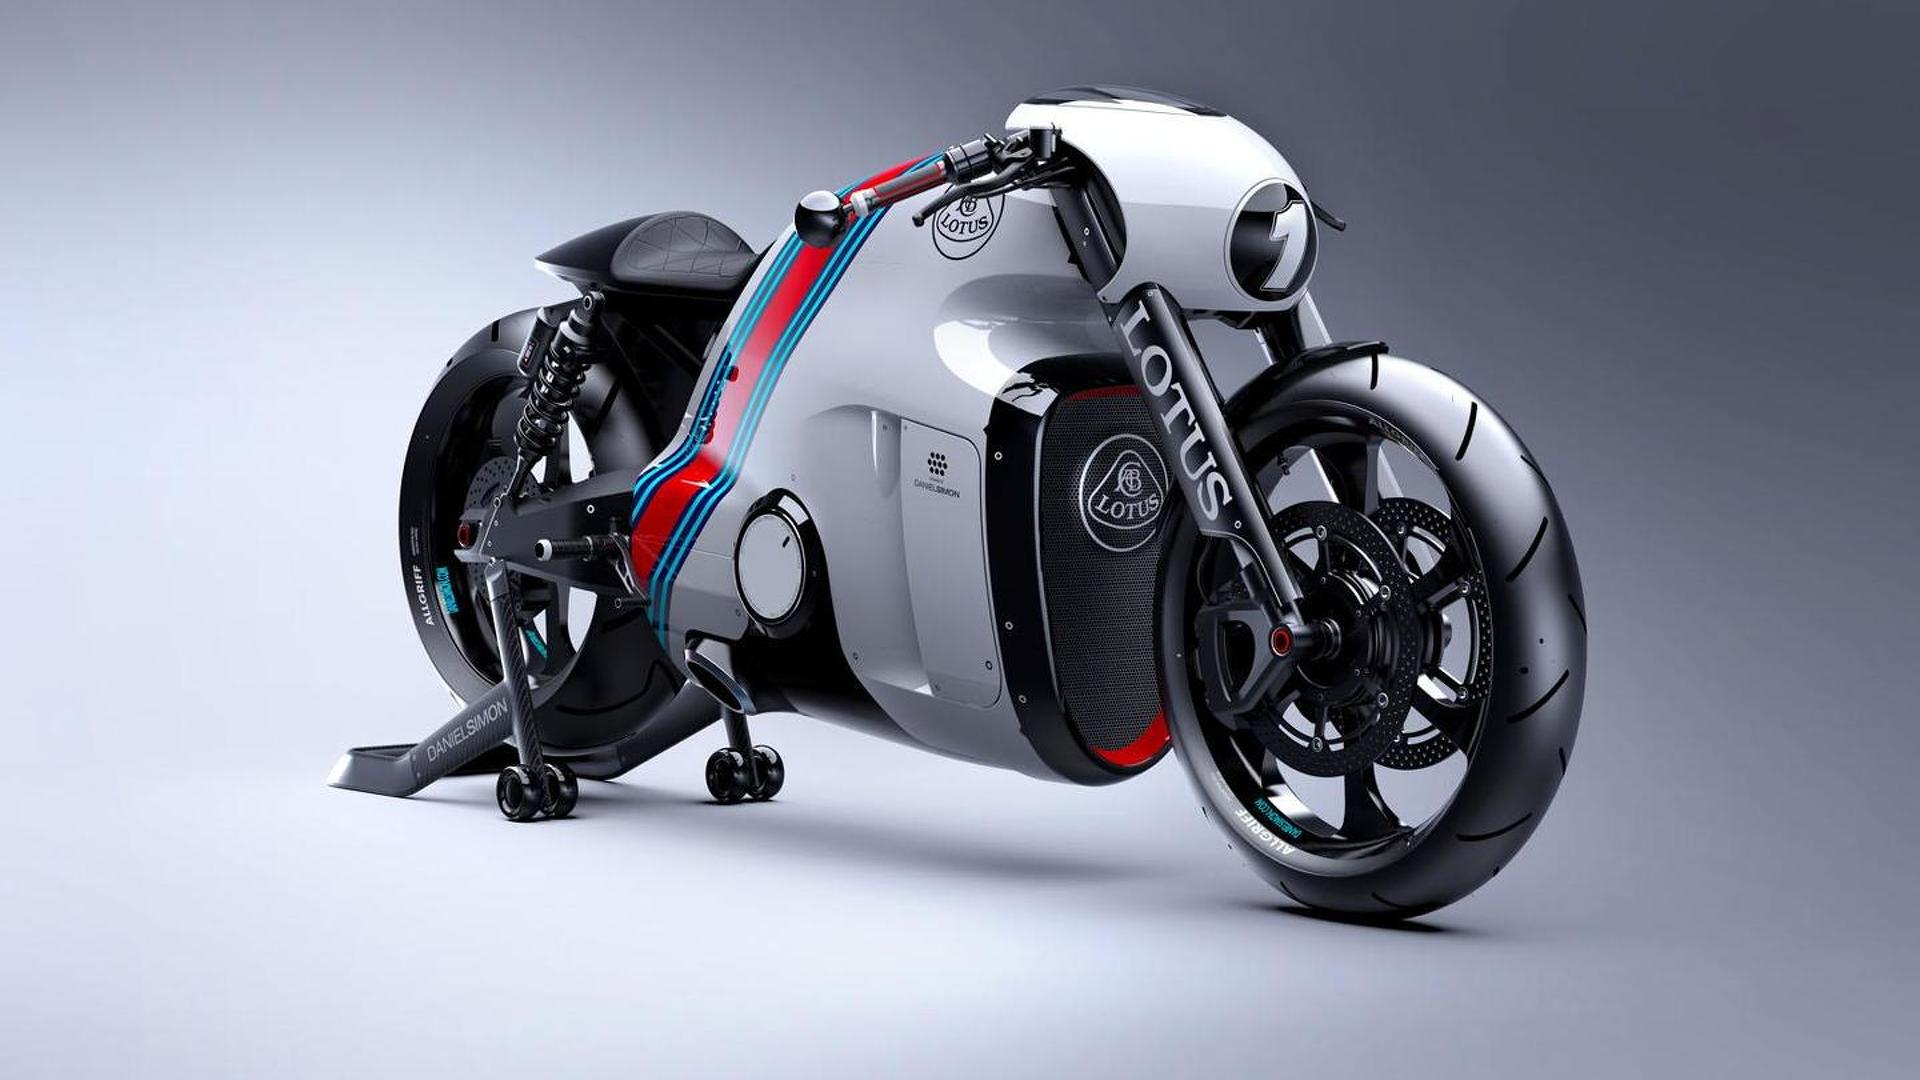 Lotus C-01 motorcycle unveiled by Kodewa